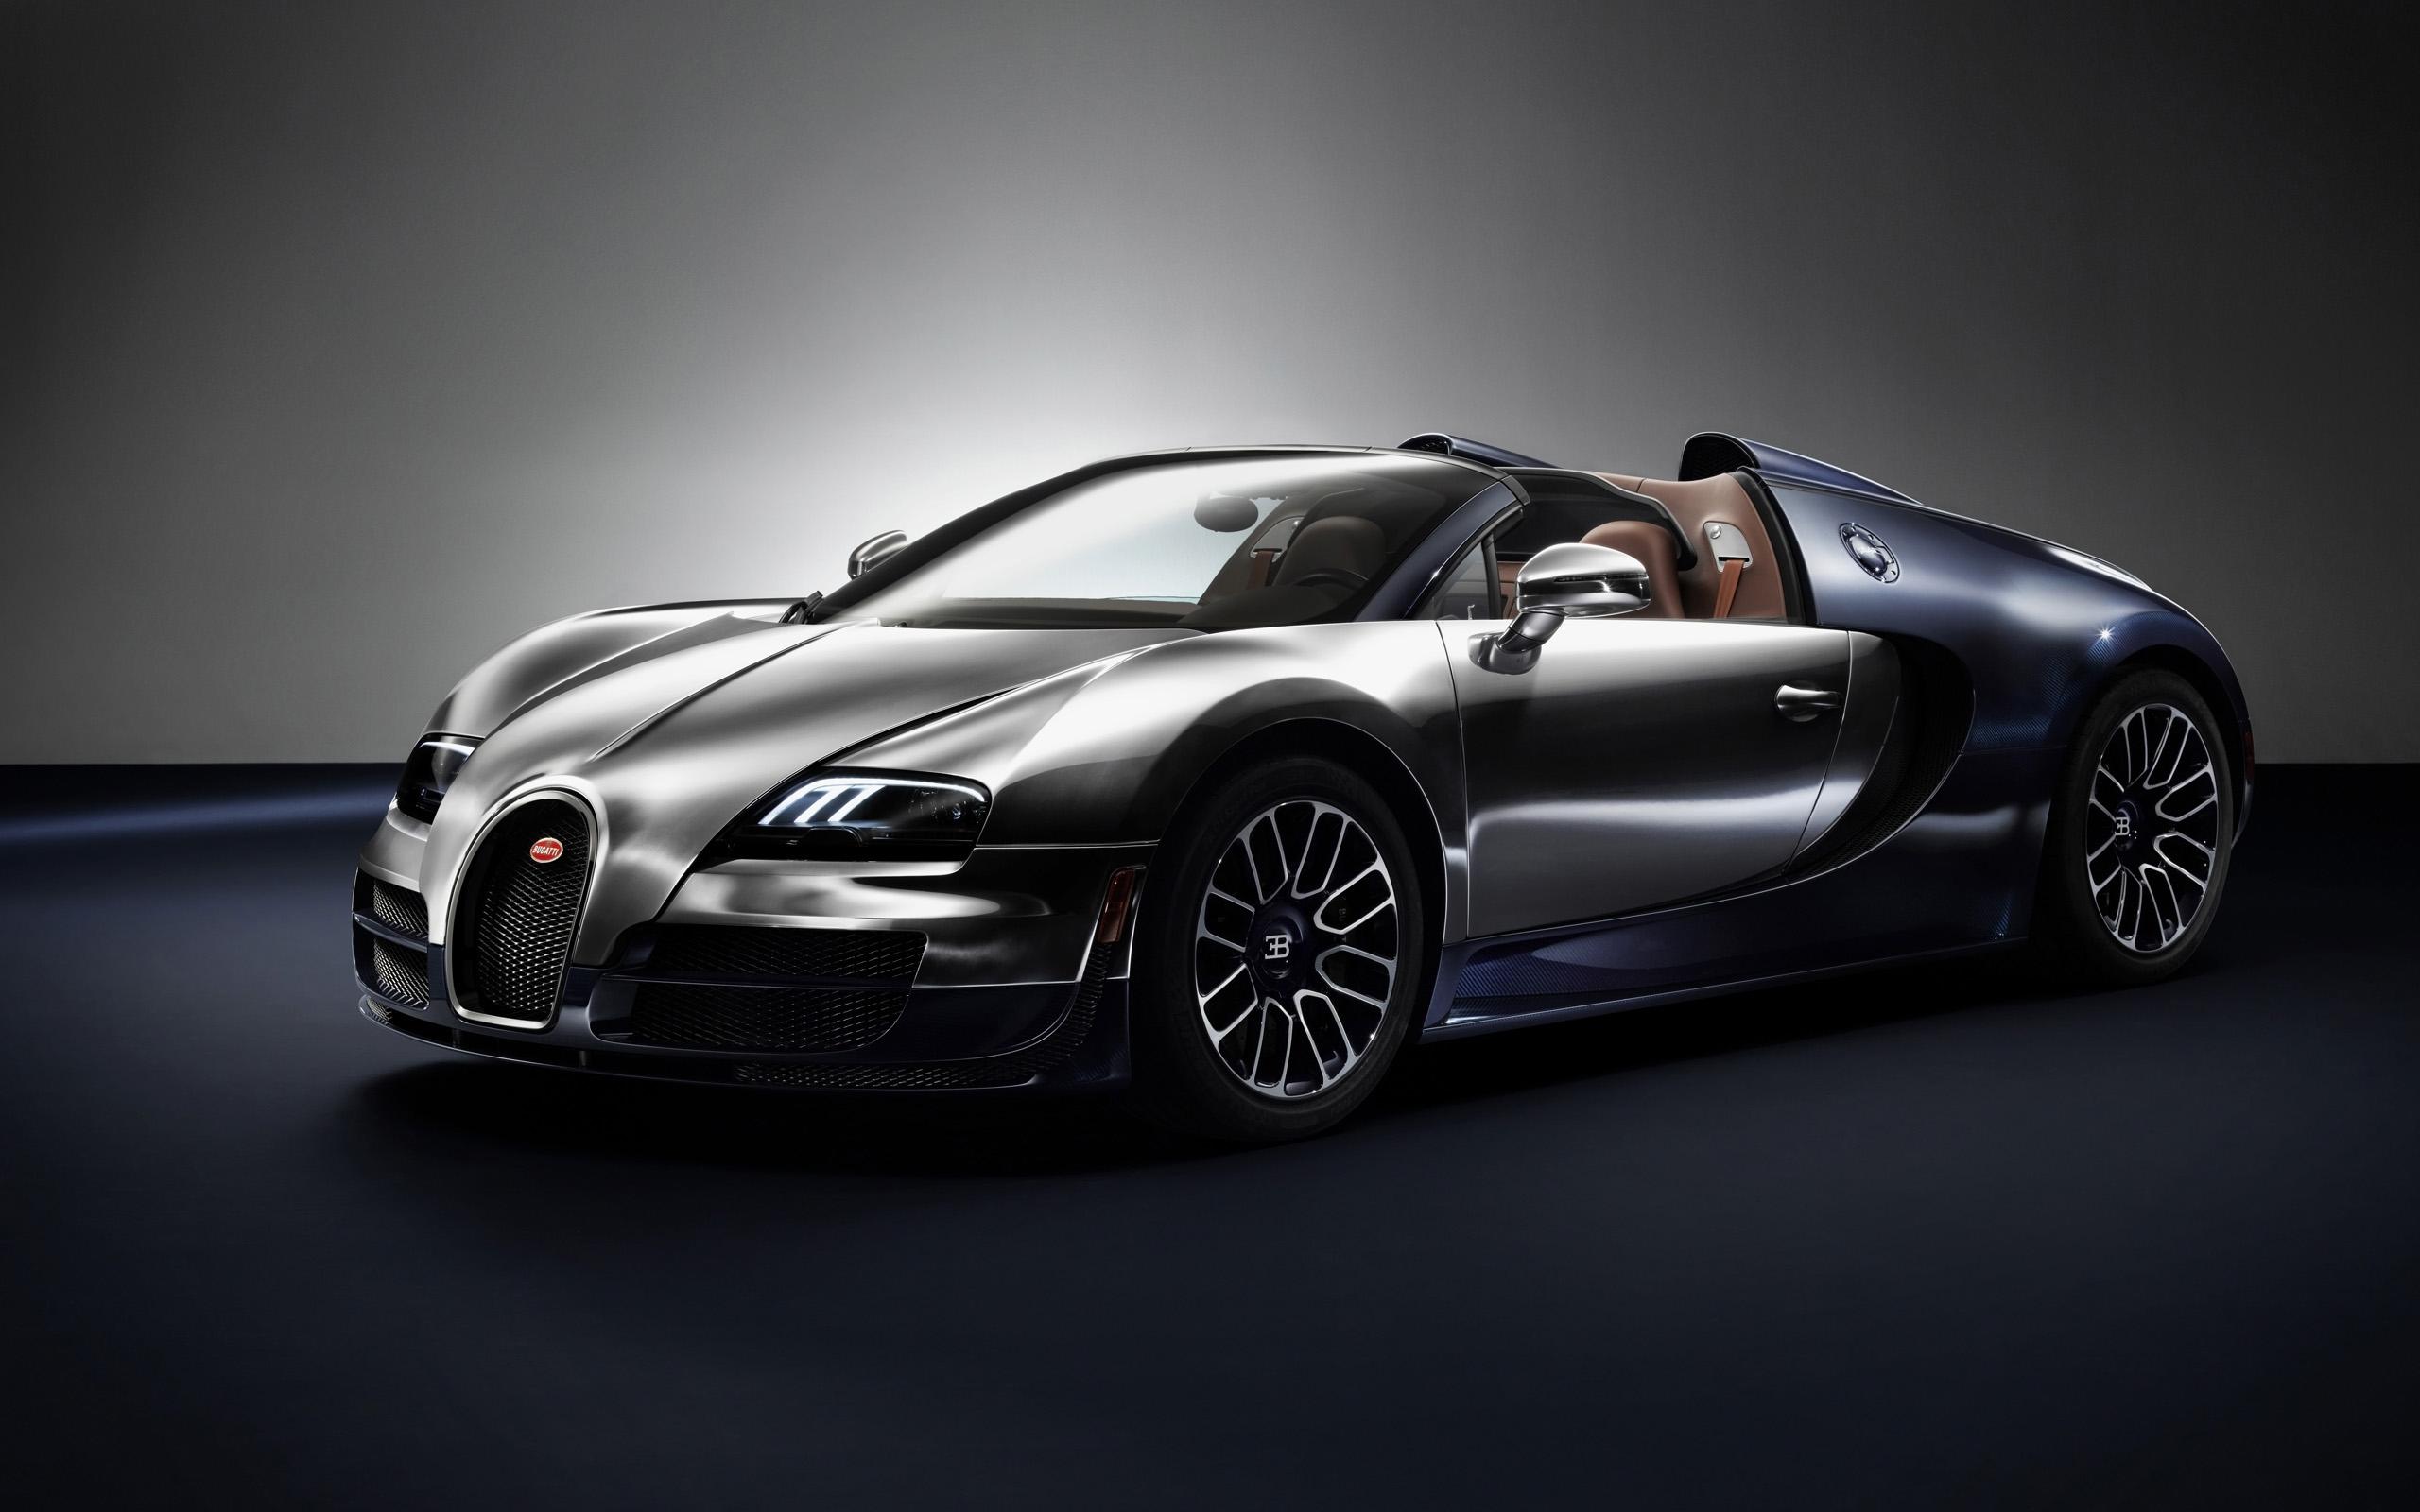 2014 Bugatti Veyron Grand Sport Vitesse Legend Ettore